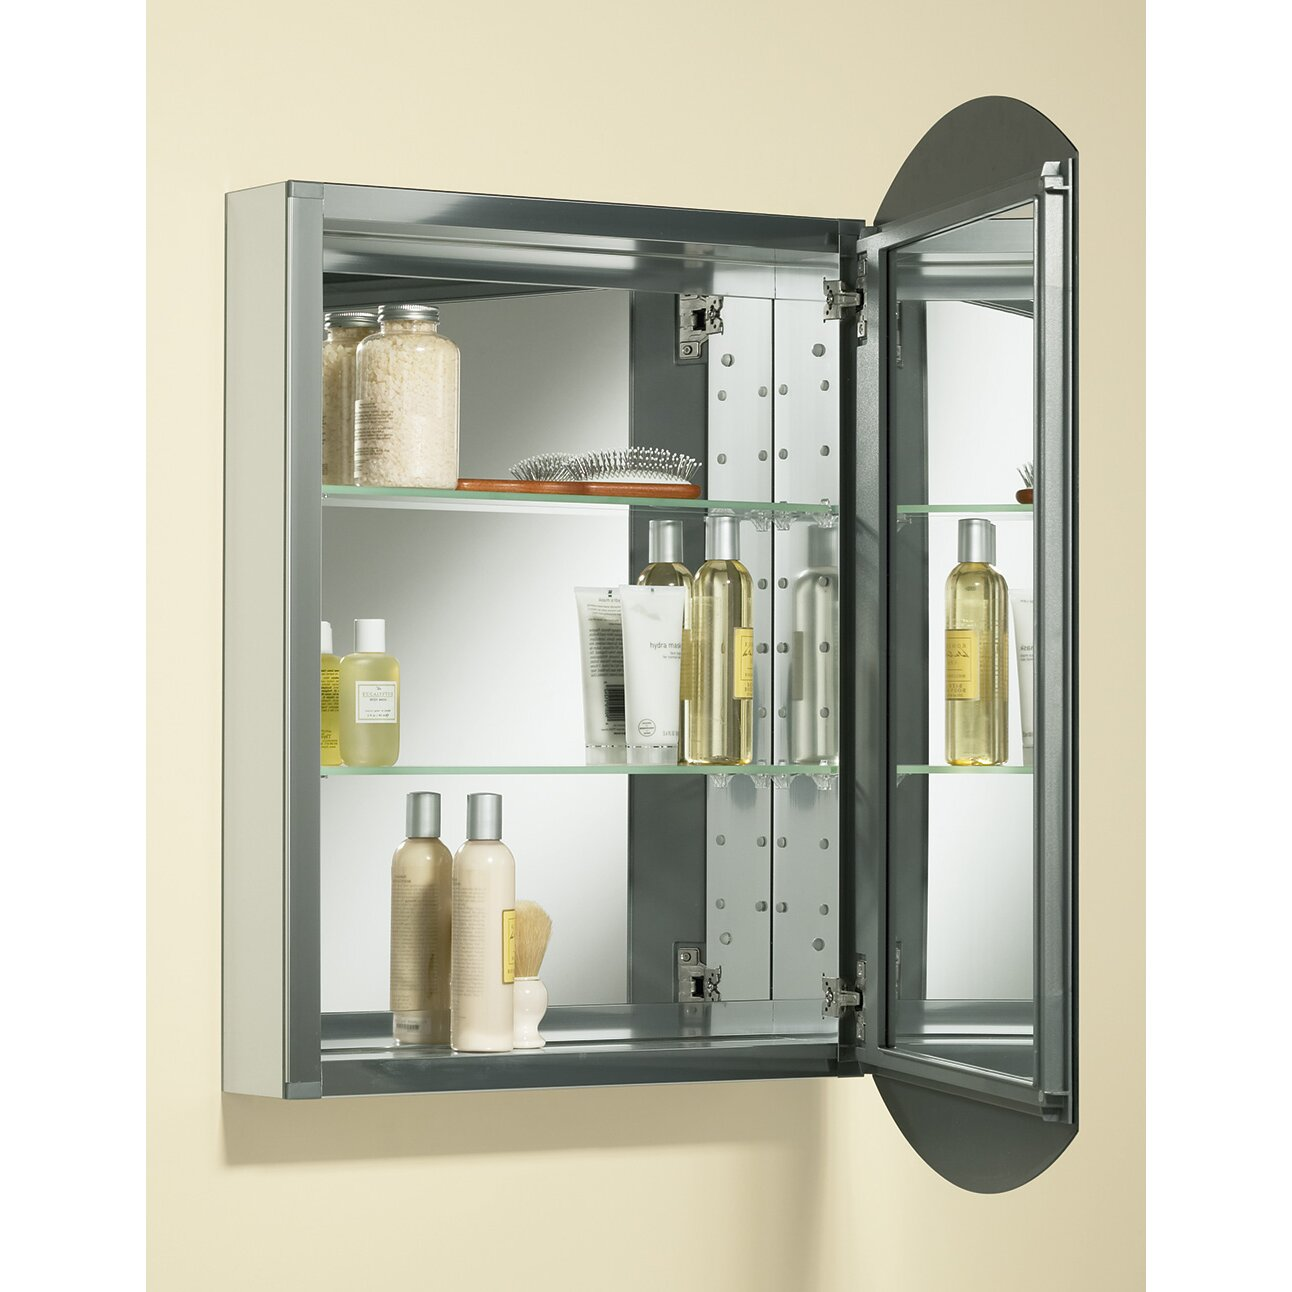 31 aluminum wall mount medicine cabinet with mirrored door by kohler